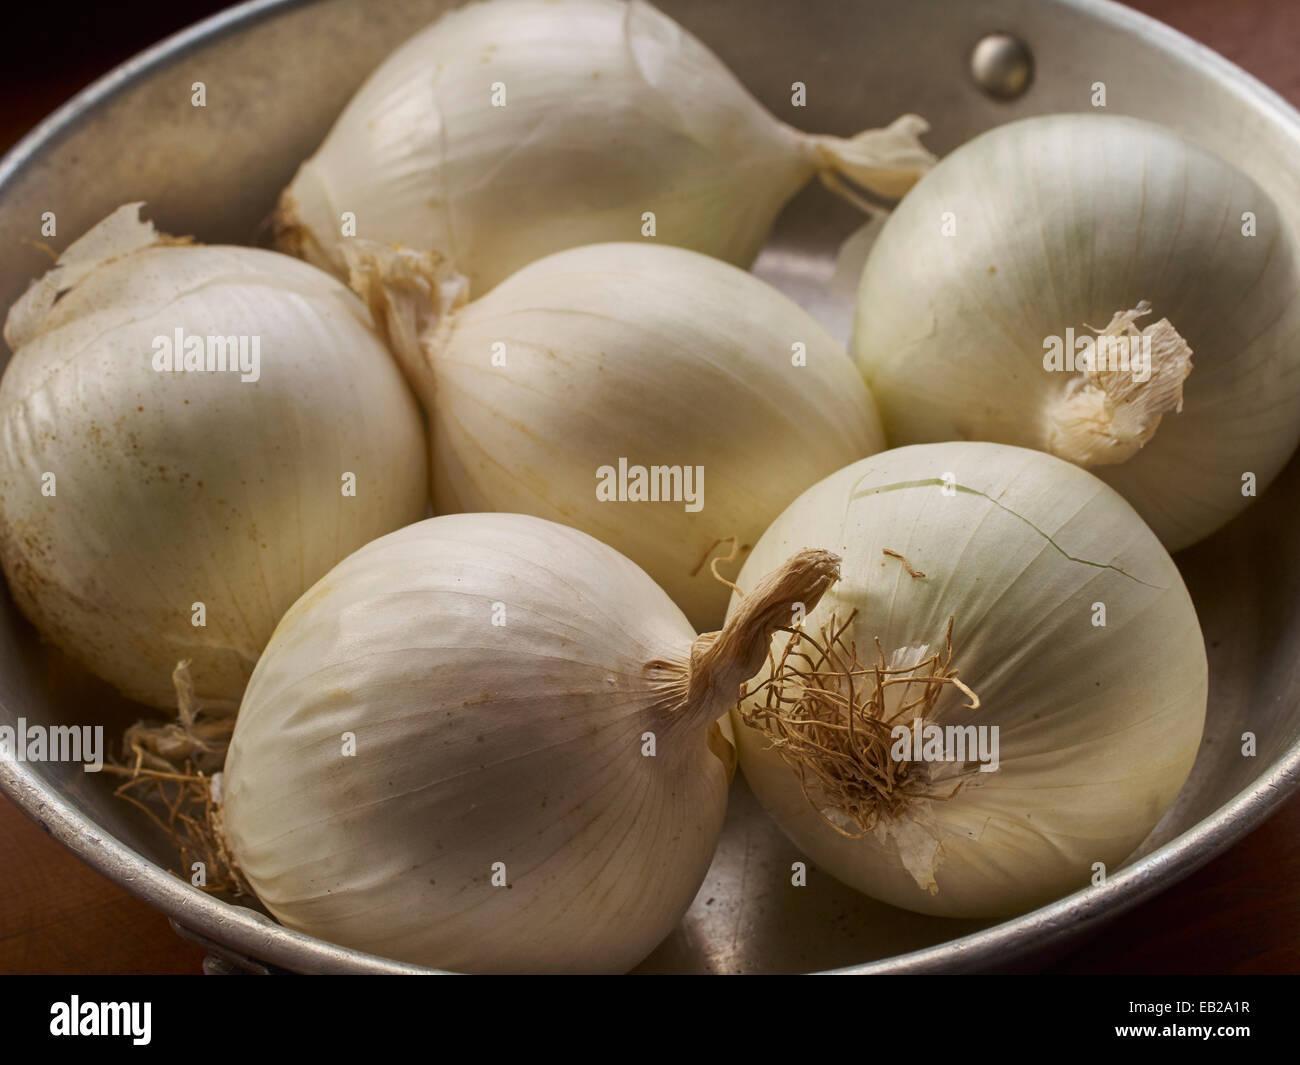 White onions - Stock Image